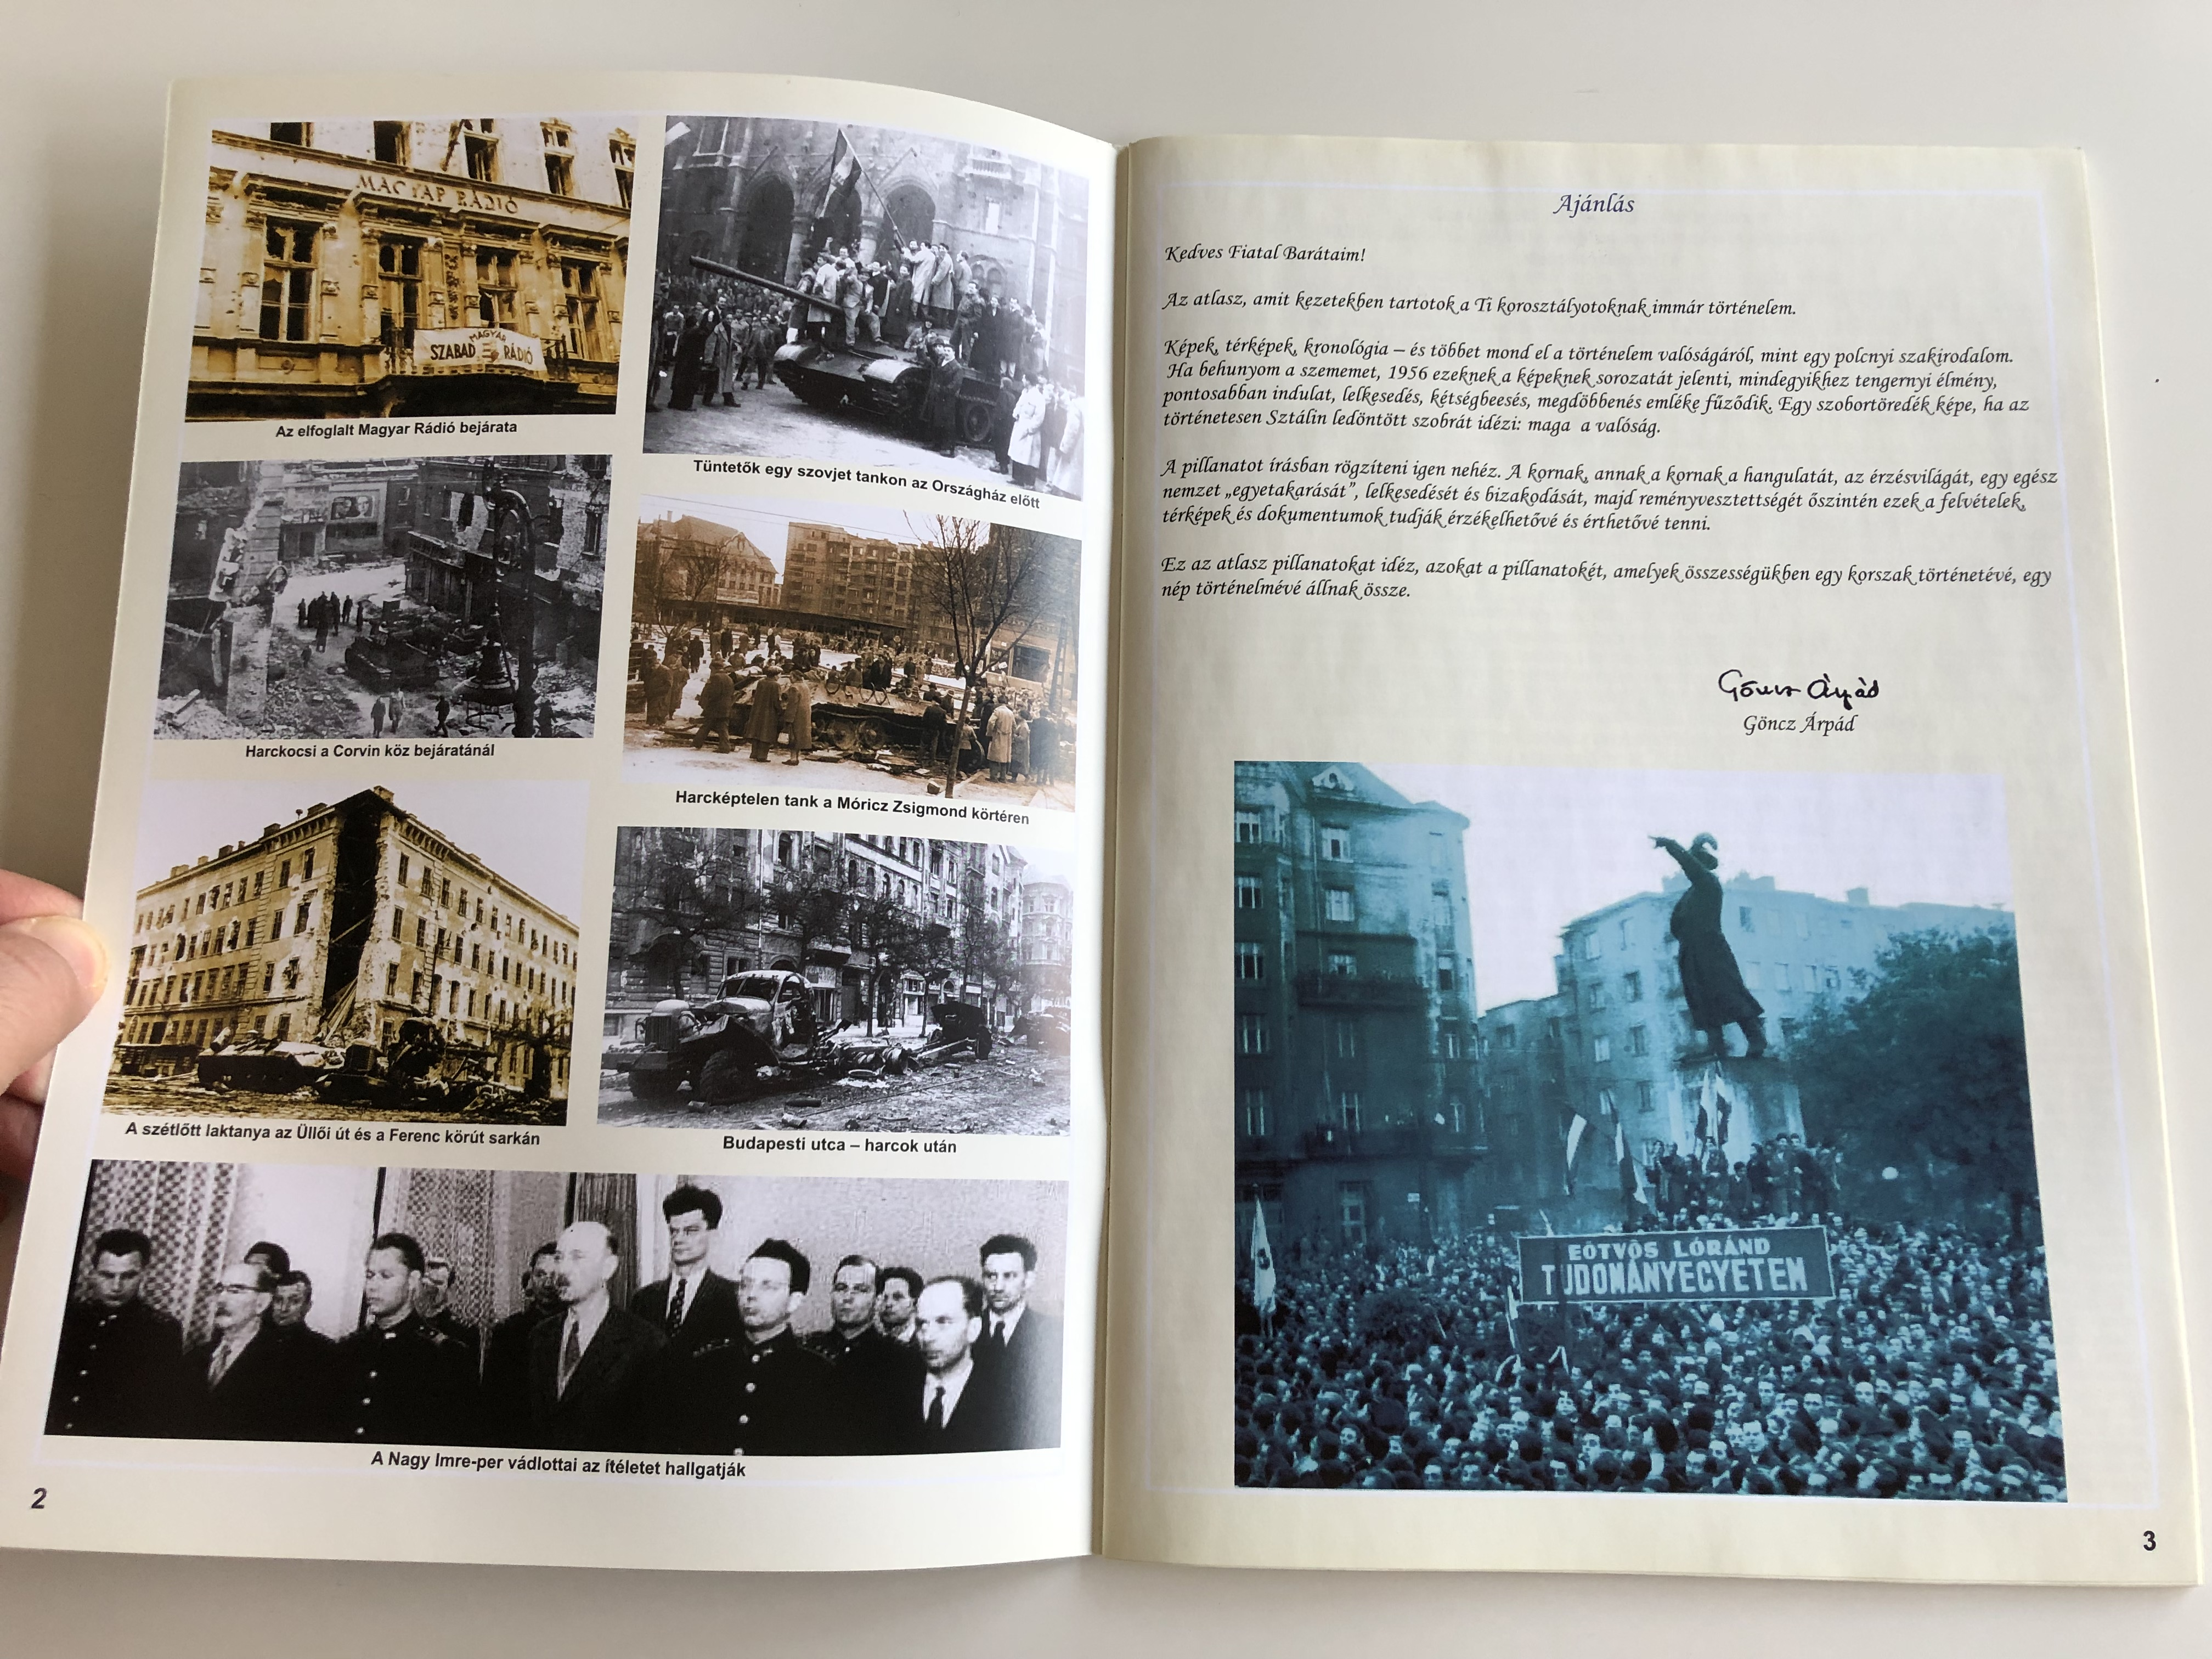 1956-esem-nyei-56-t-rk-peken-s-k-peken-t-rt-nelmi-atlas-the-events-of-1956-on-maps-and-photos-historical-atlas-2006-2-.jpg